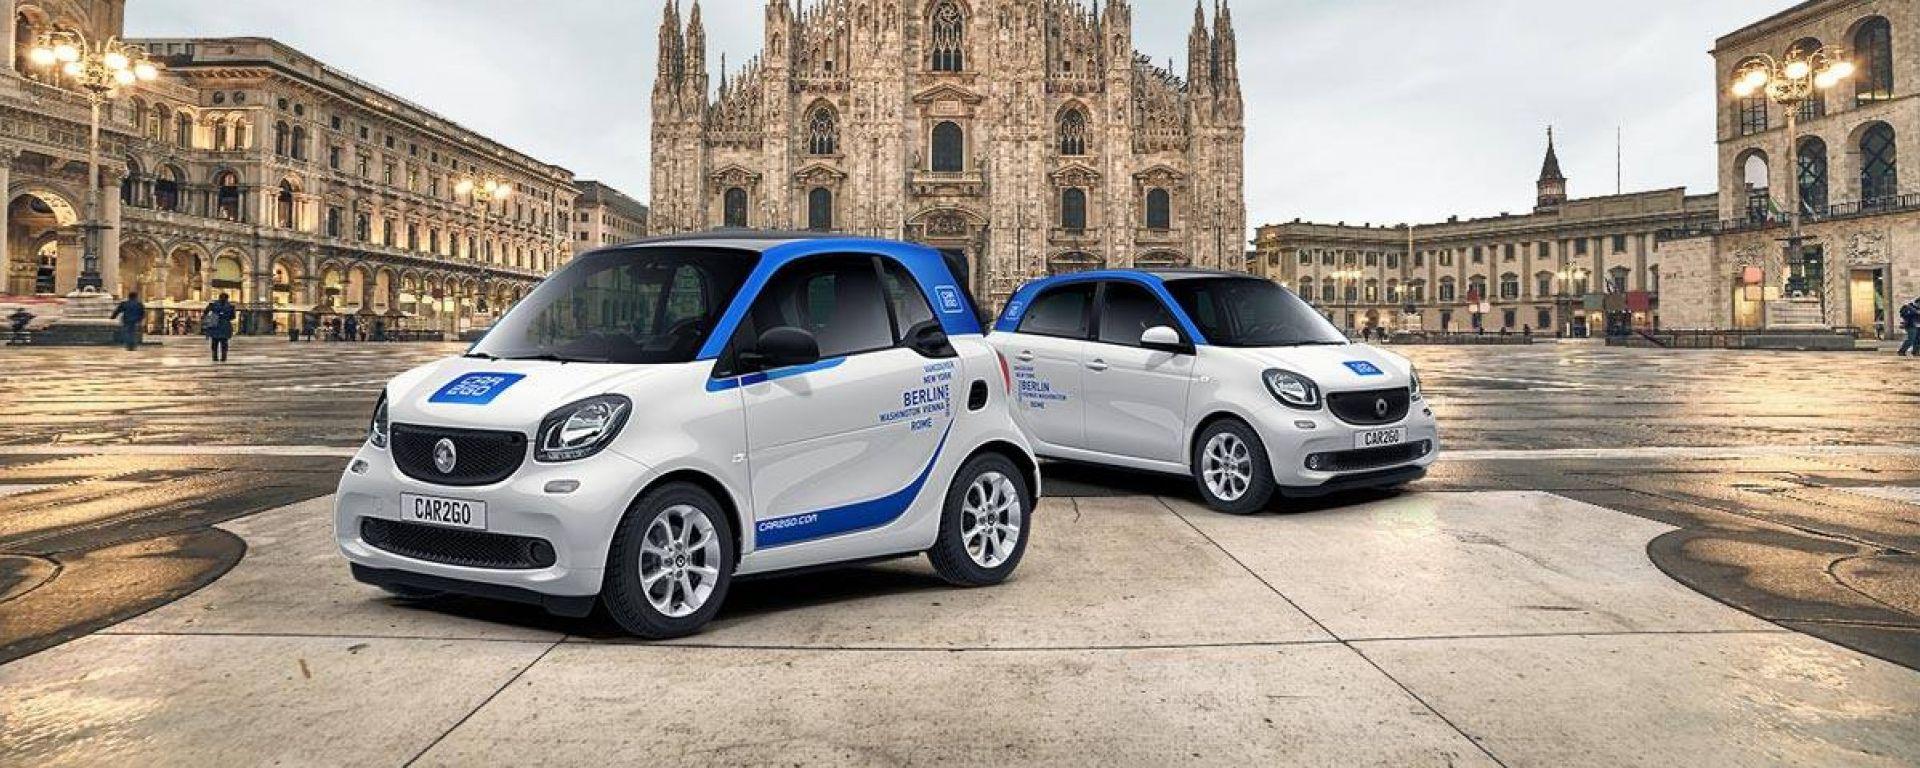 Car2go si rinnova: a Milano sbarcano 750 nuove smart fortwo e 50 forfour